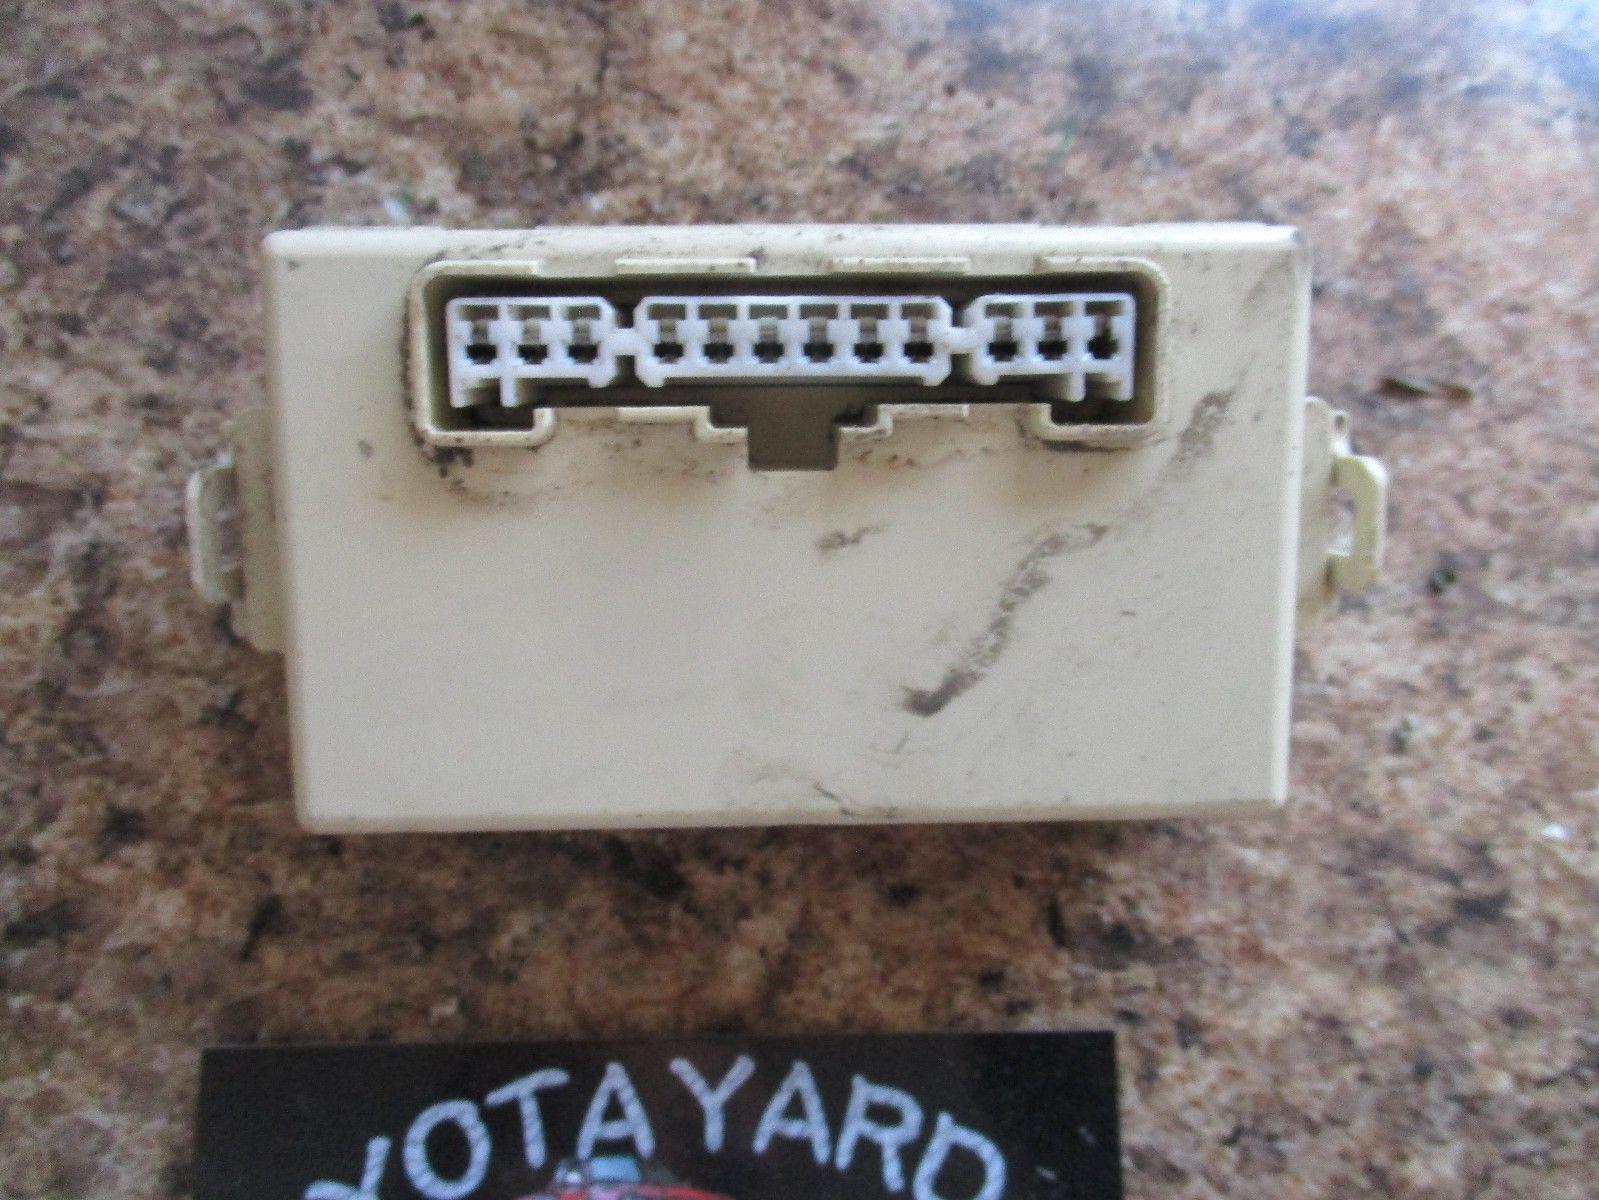 ... 97 98 99 Toyota Tacoma Fuse Box Relay Integration 82641-04010 YOTA YARD